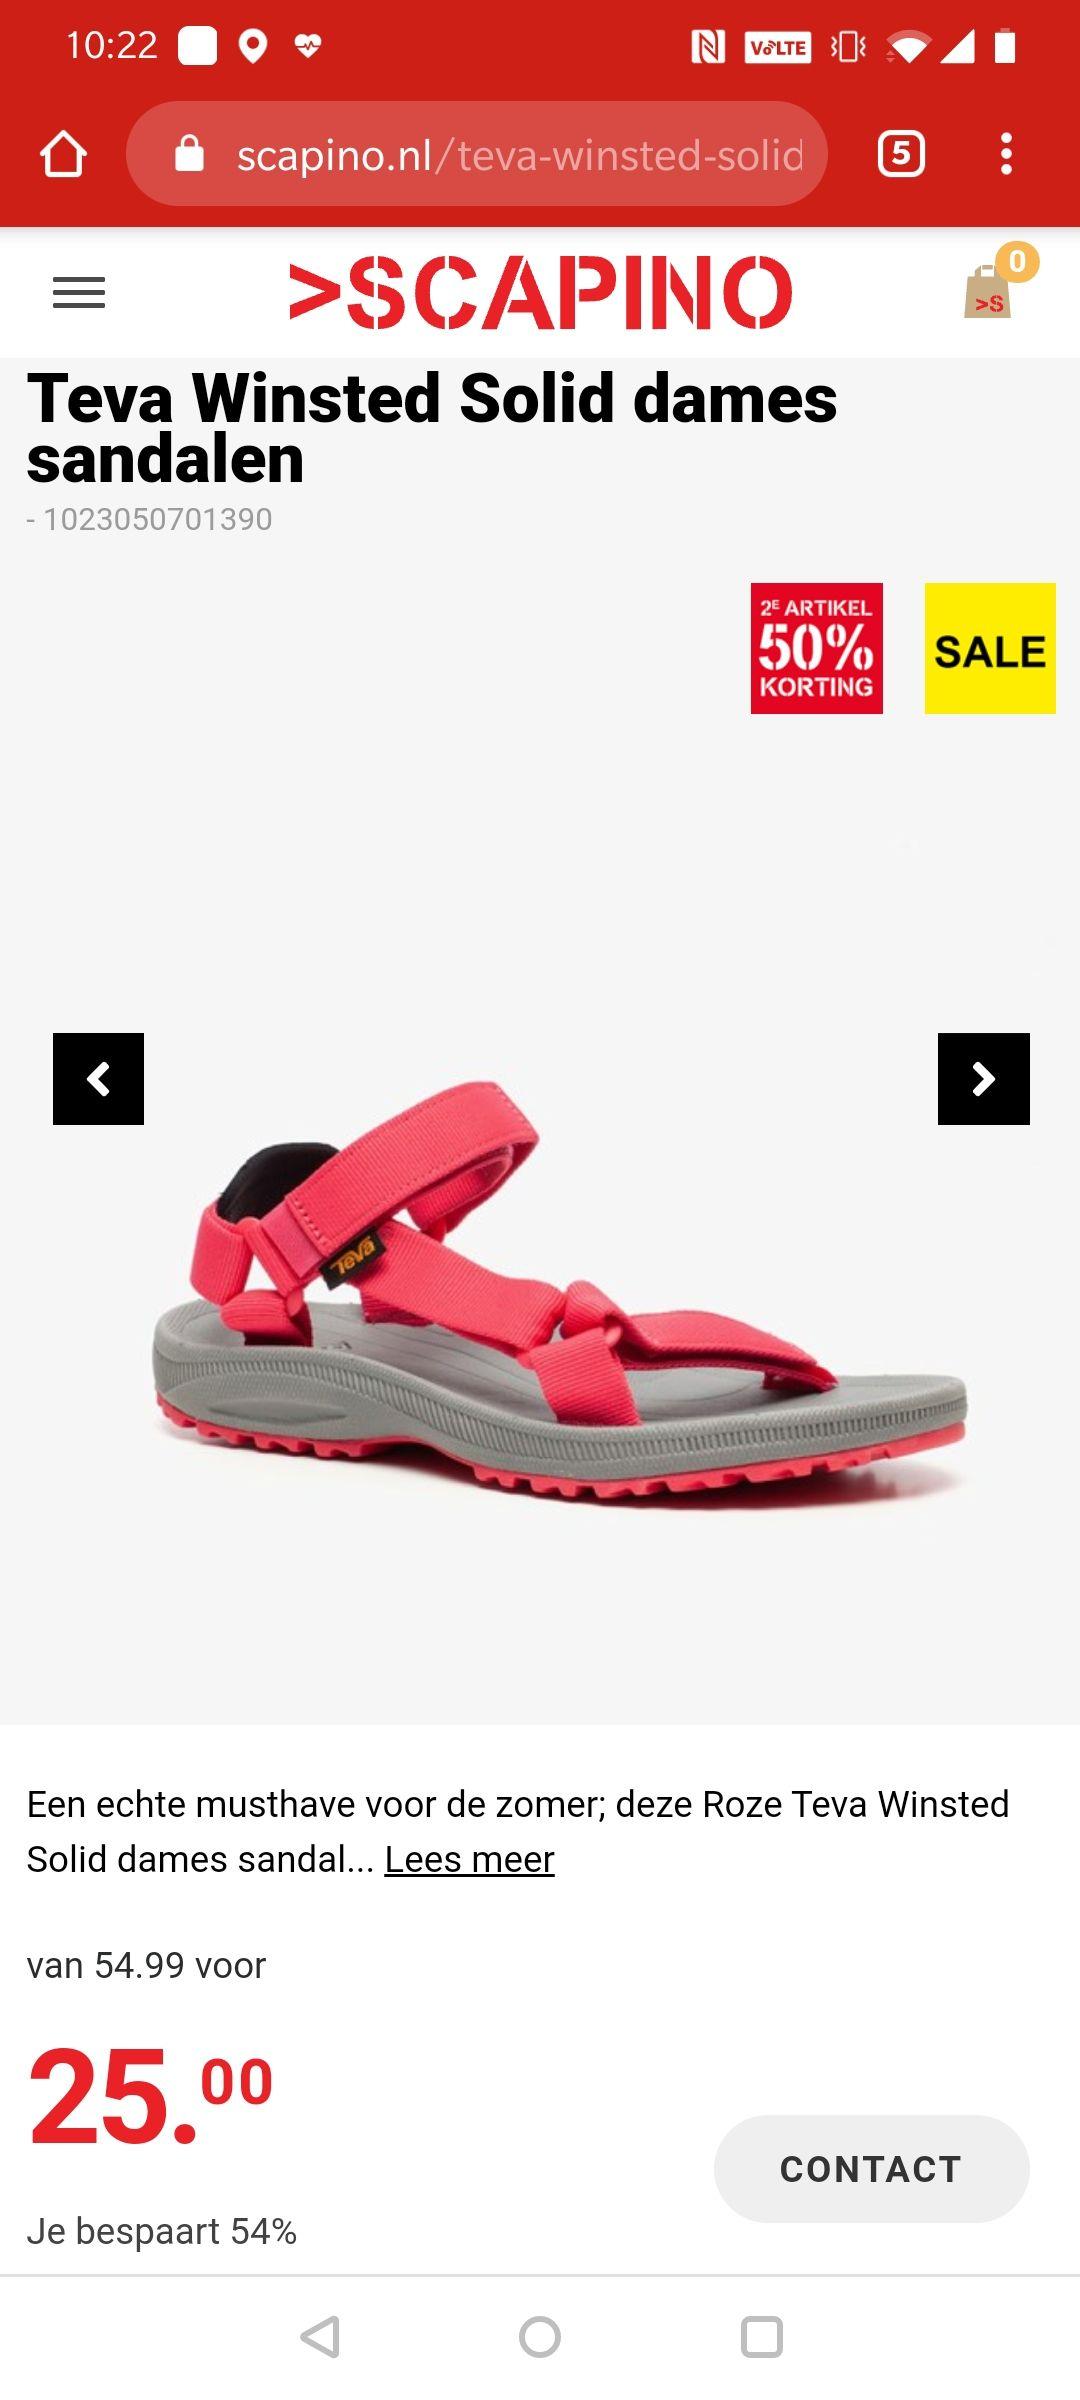 Teva sandalen - 2e paar halve prijs @ Scapino